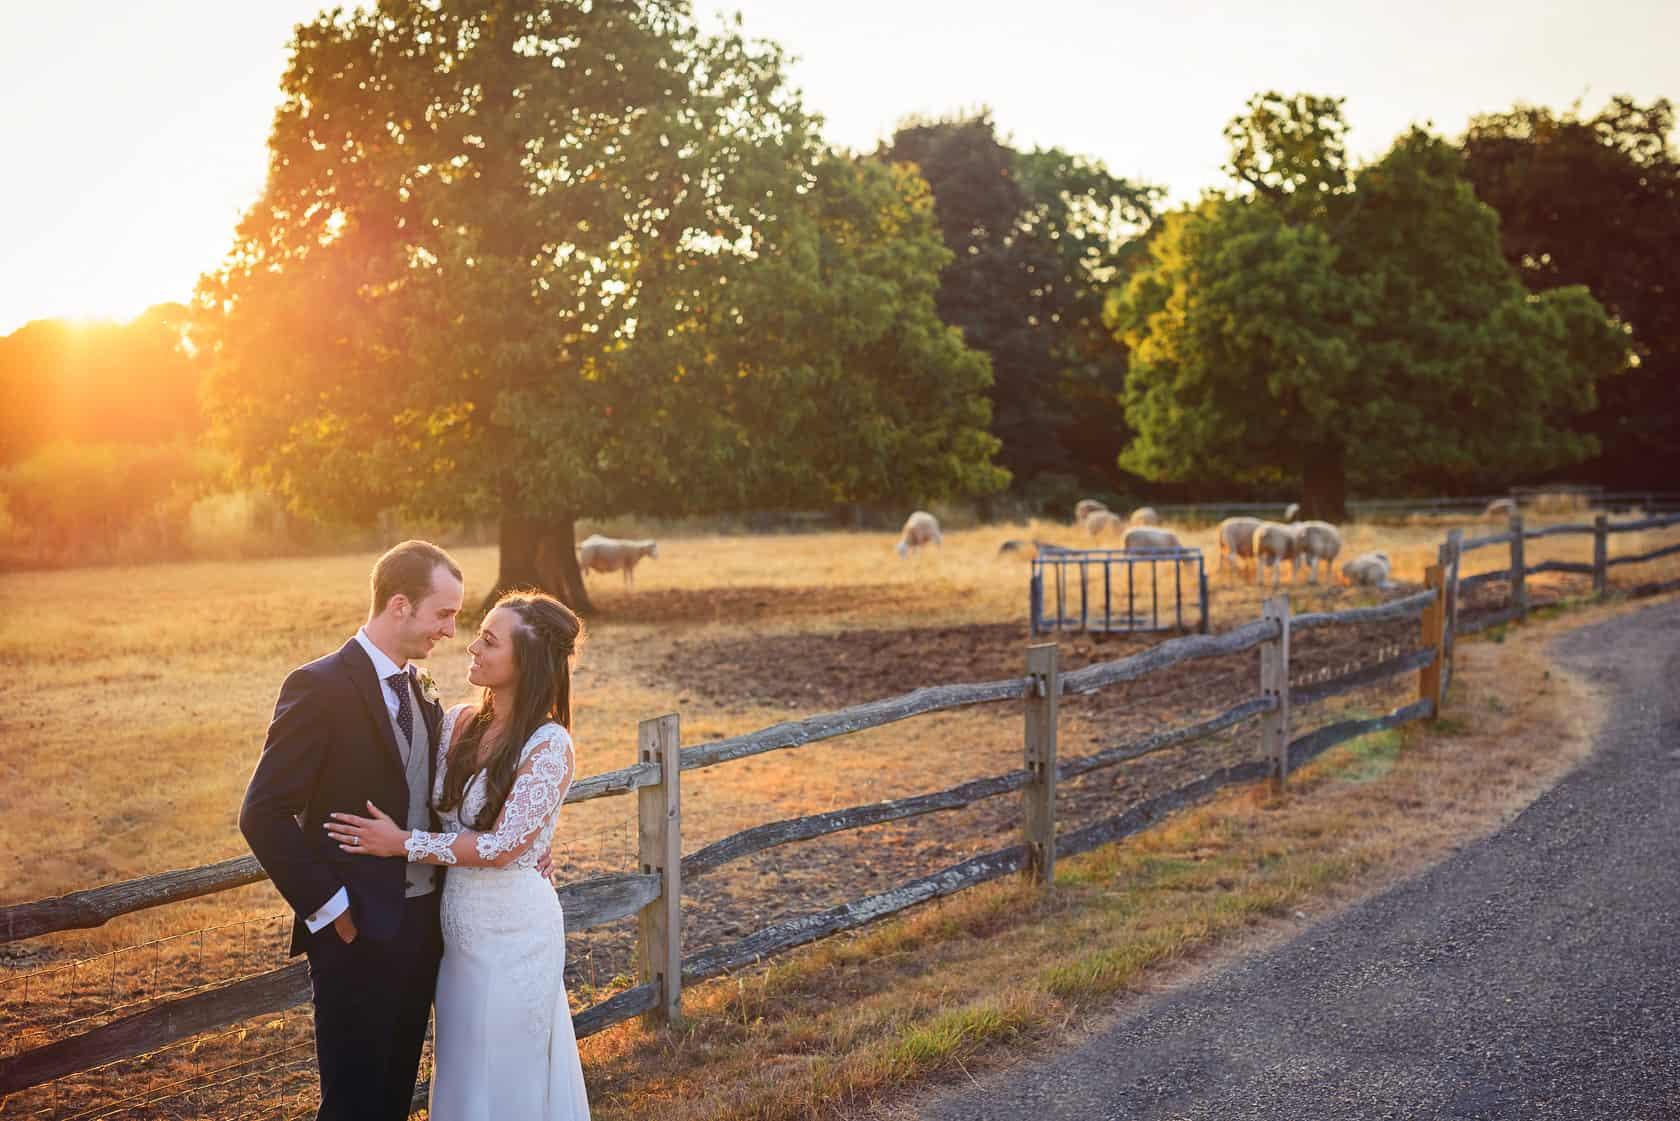 Best_Wedding_Photography_2018_Wedding-Photographer-Essex-and-London_052